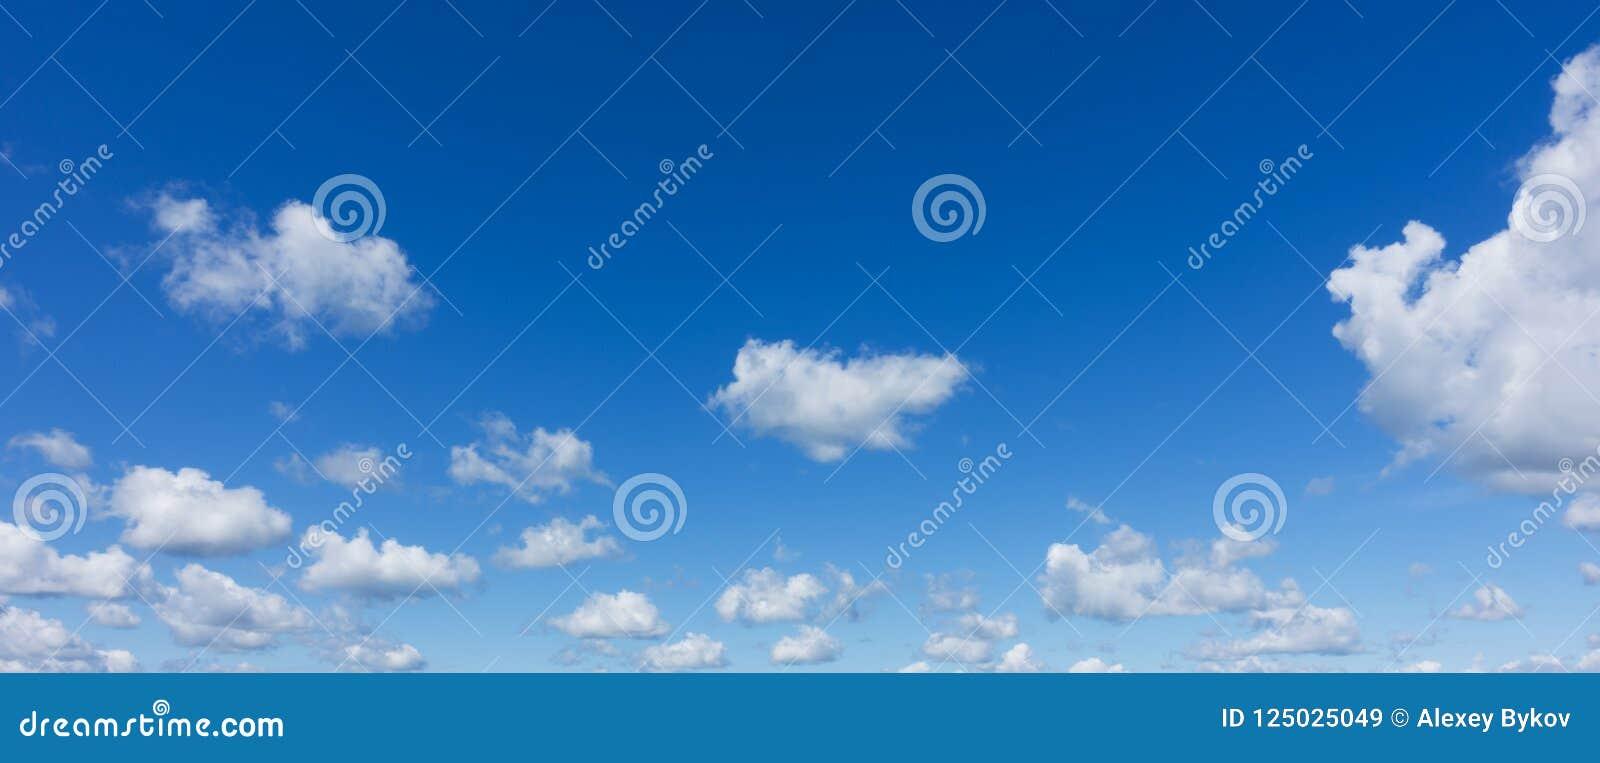 Beautiful blue sky. Professional shoot, no birds, no noise.